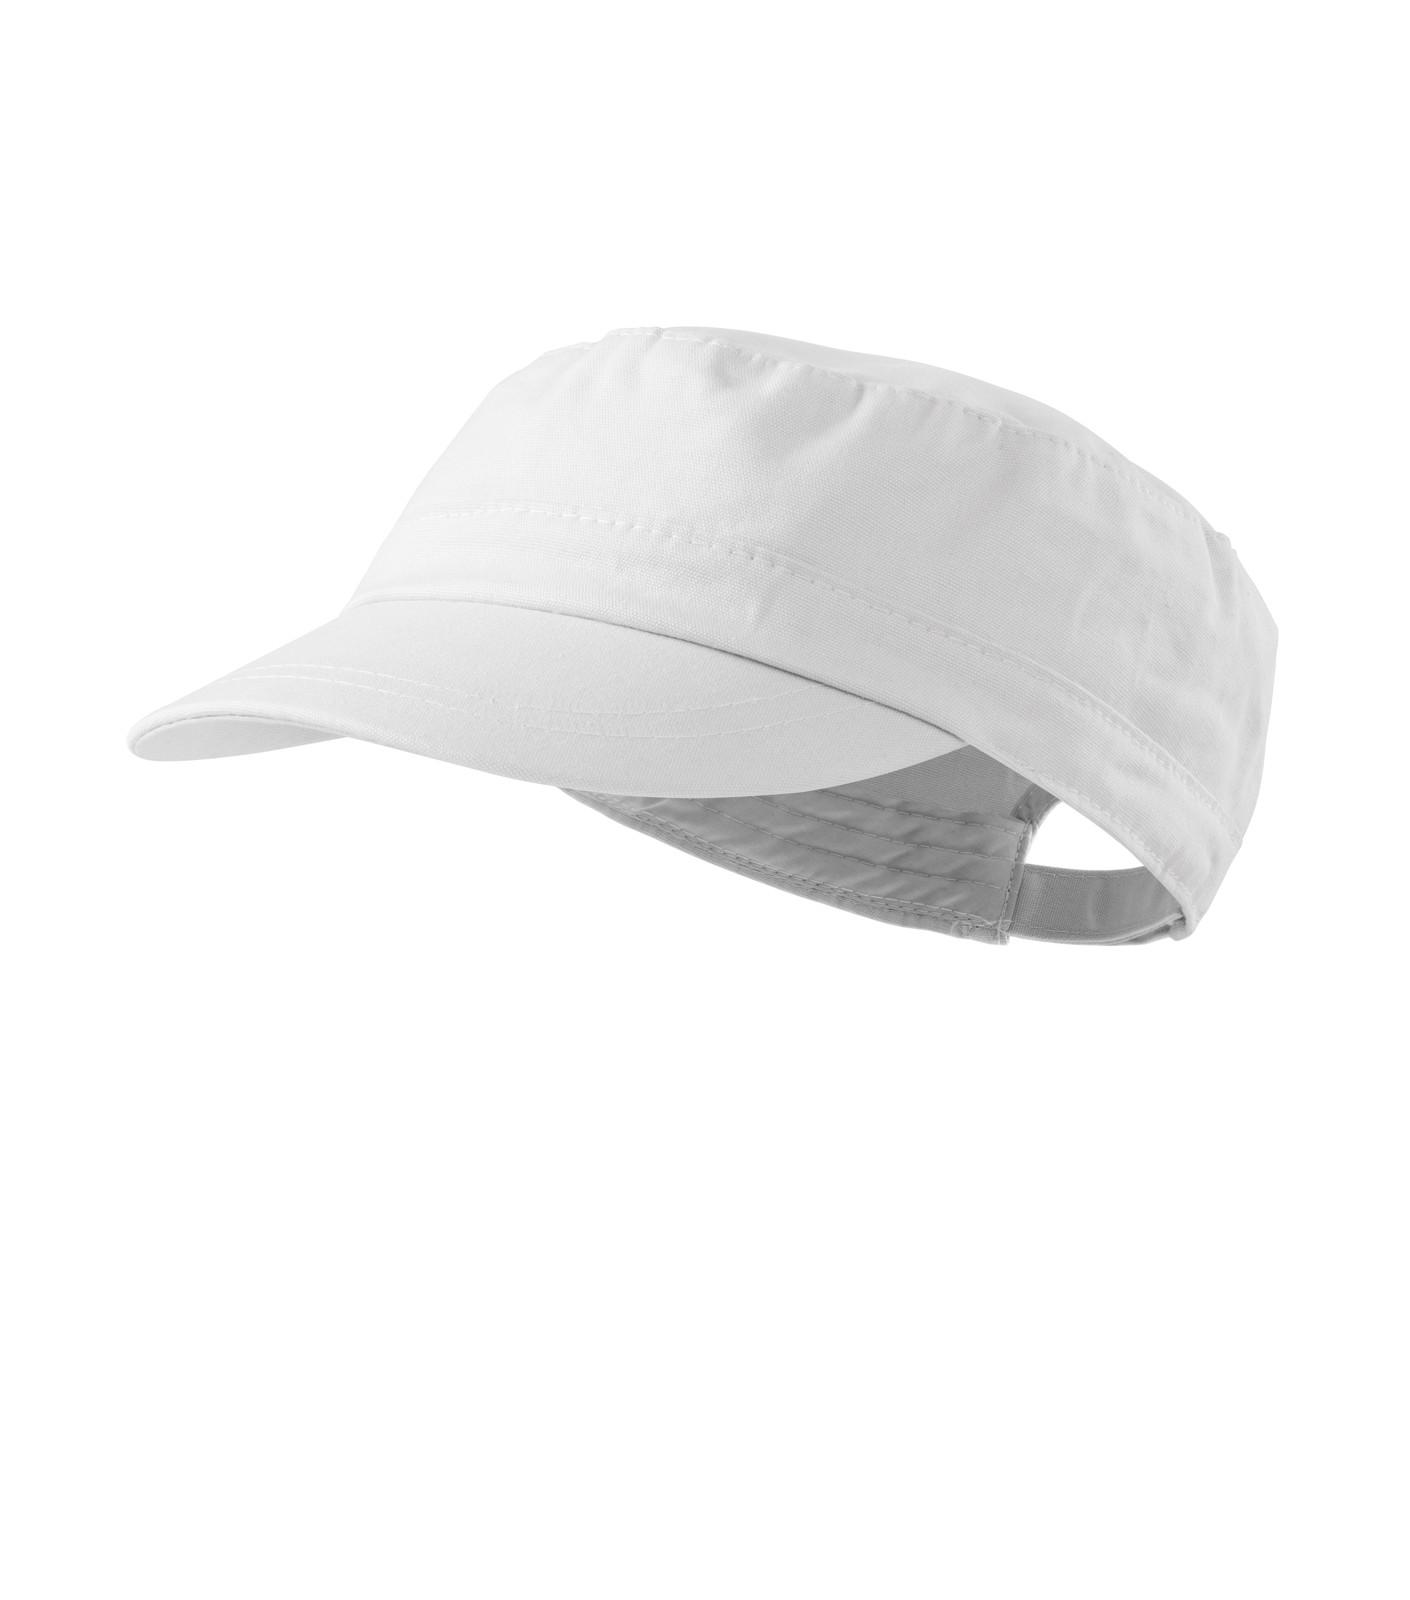 Cap unisex Malfini Latino - White / adjustable